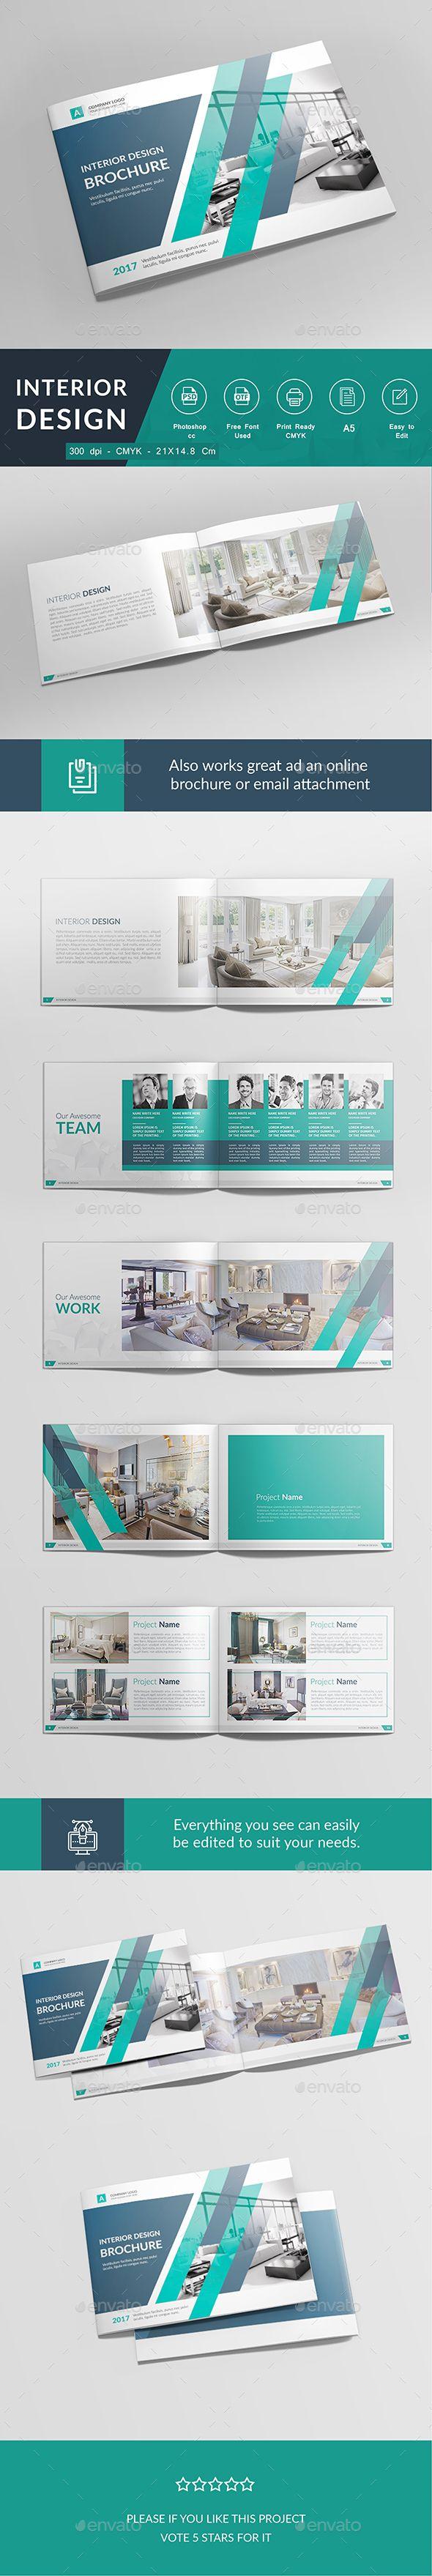 Interior Brochure Design Template PSD